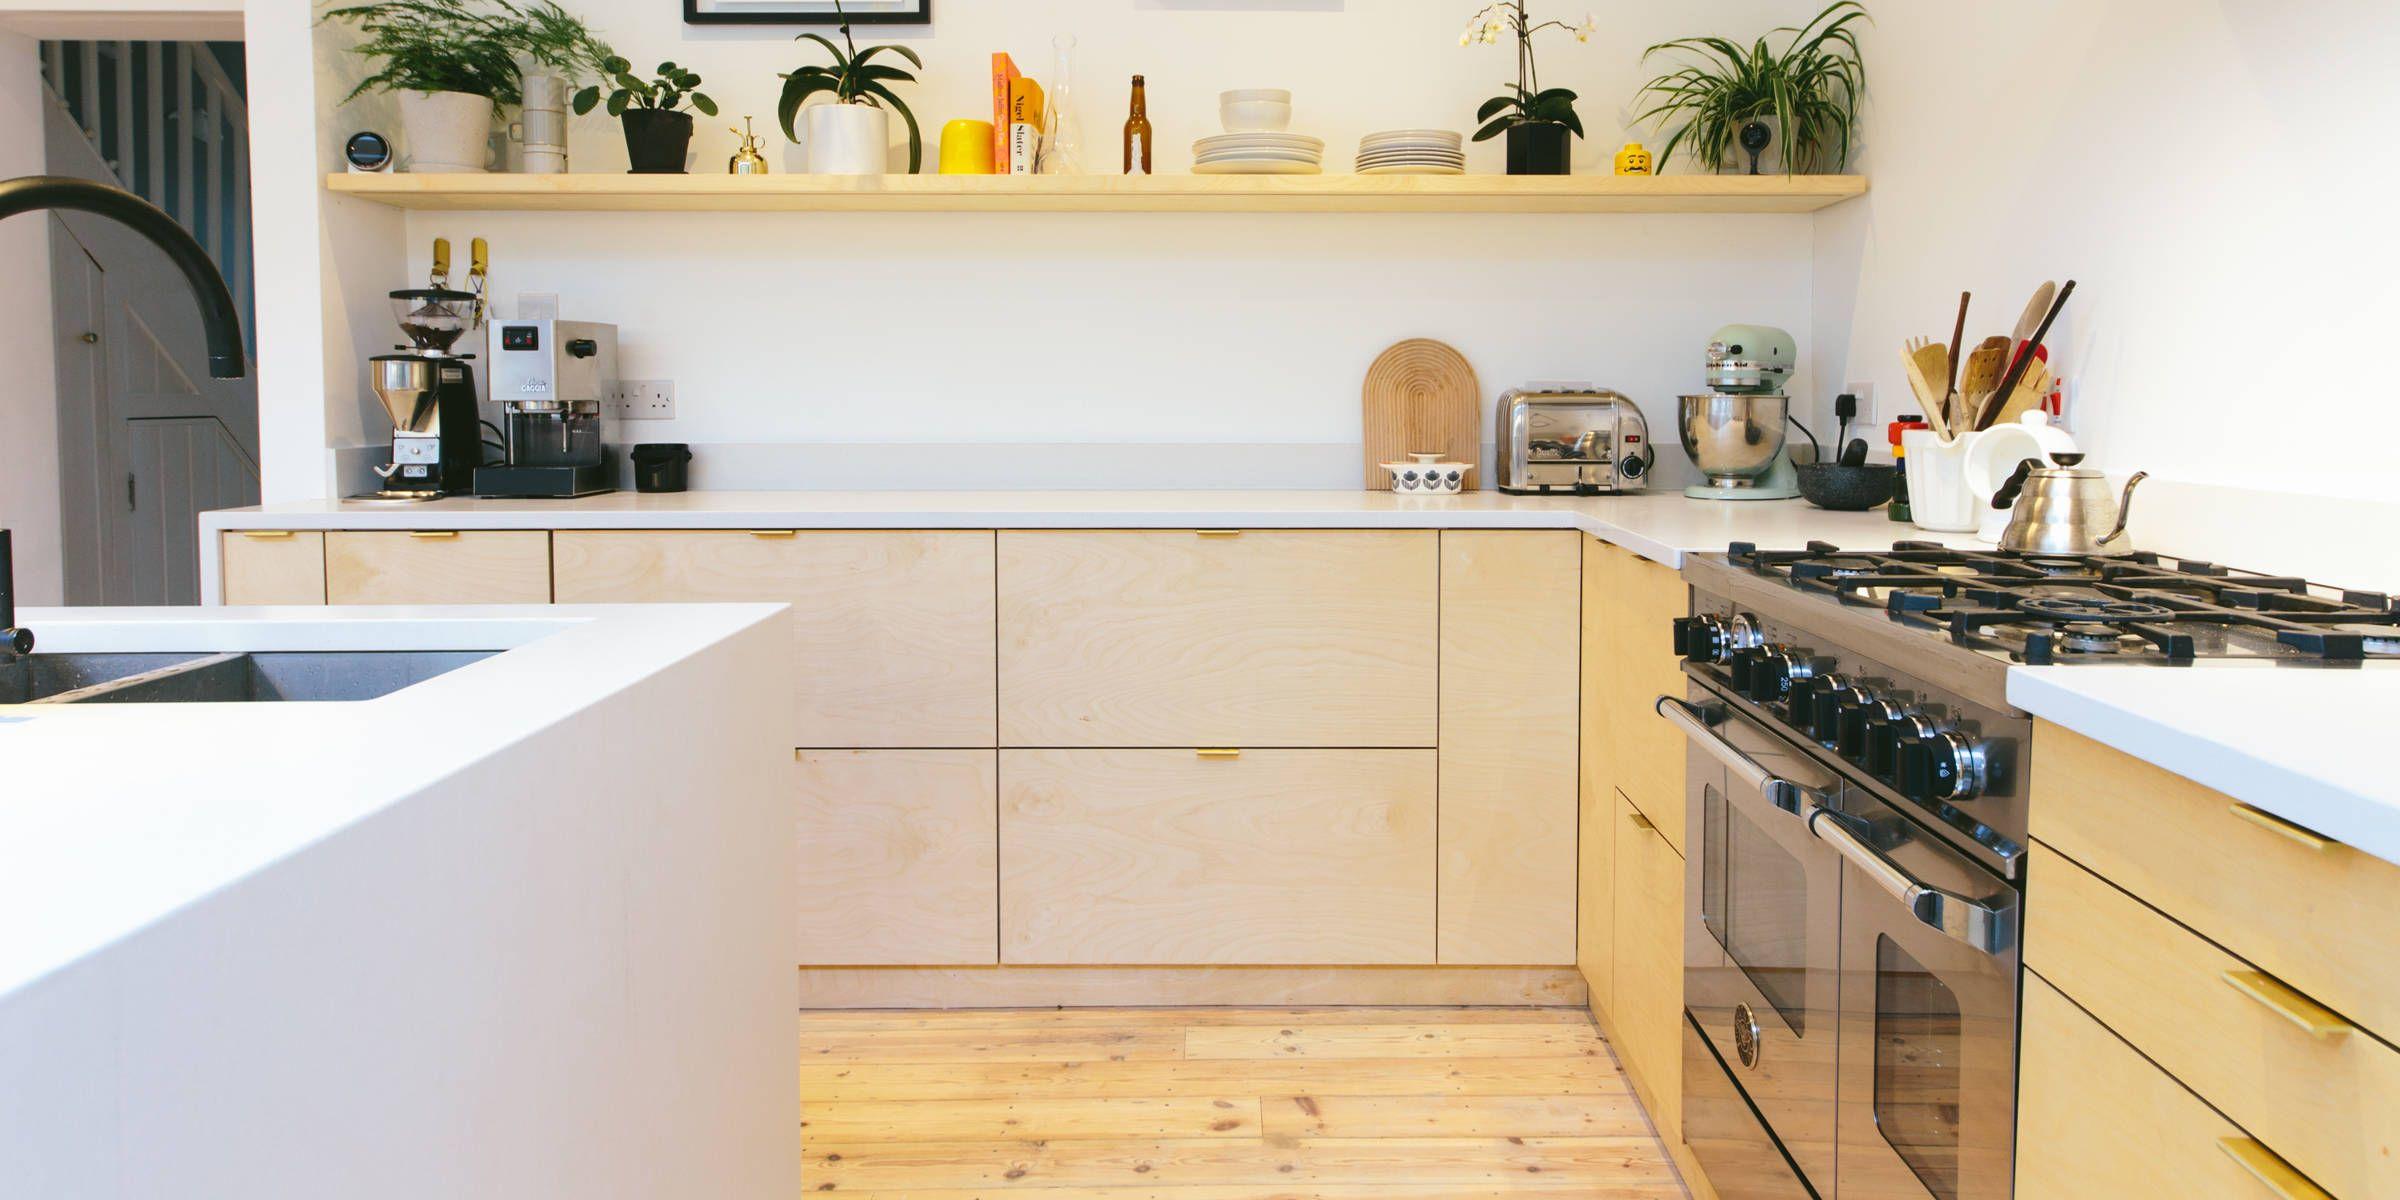 Object object kitchen pinterest ikea kitchen cabinets